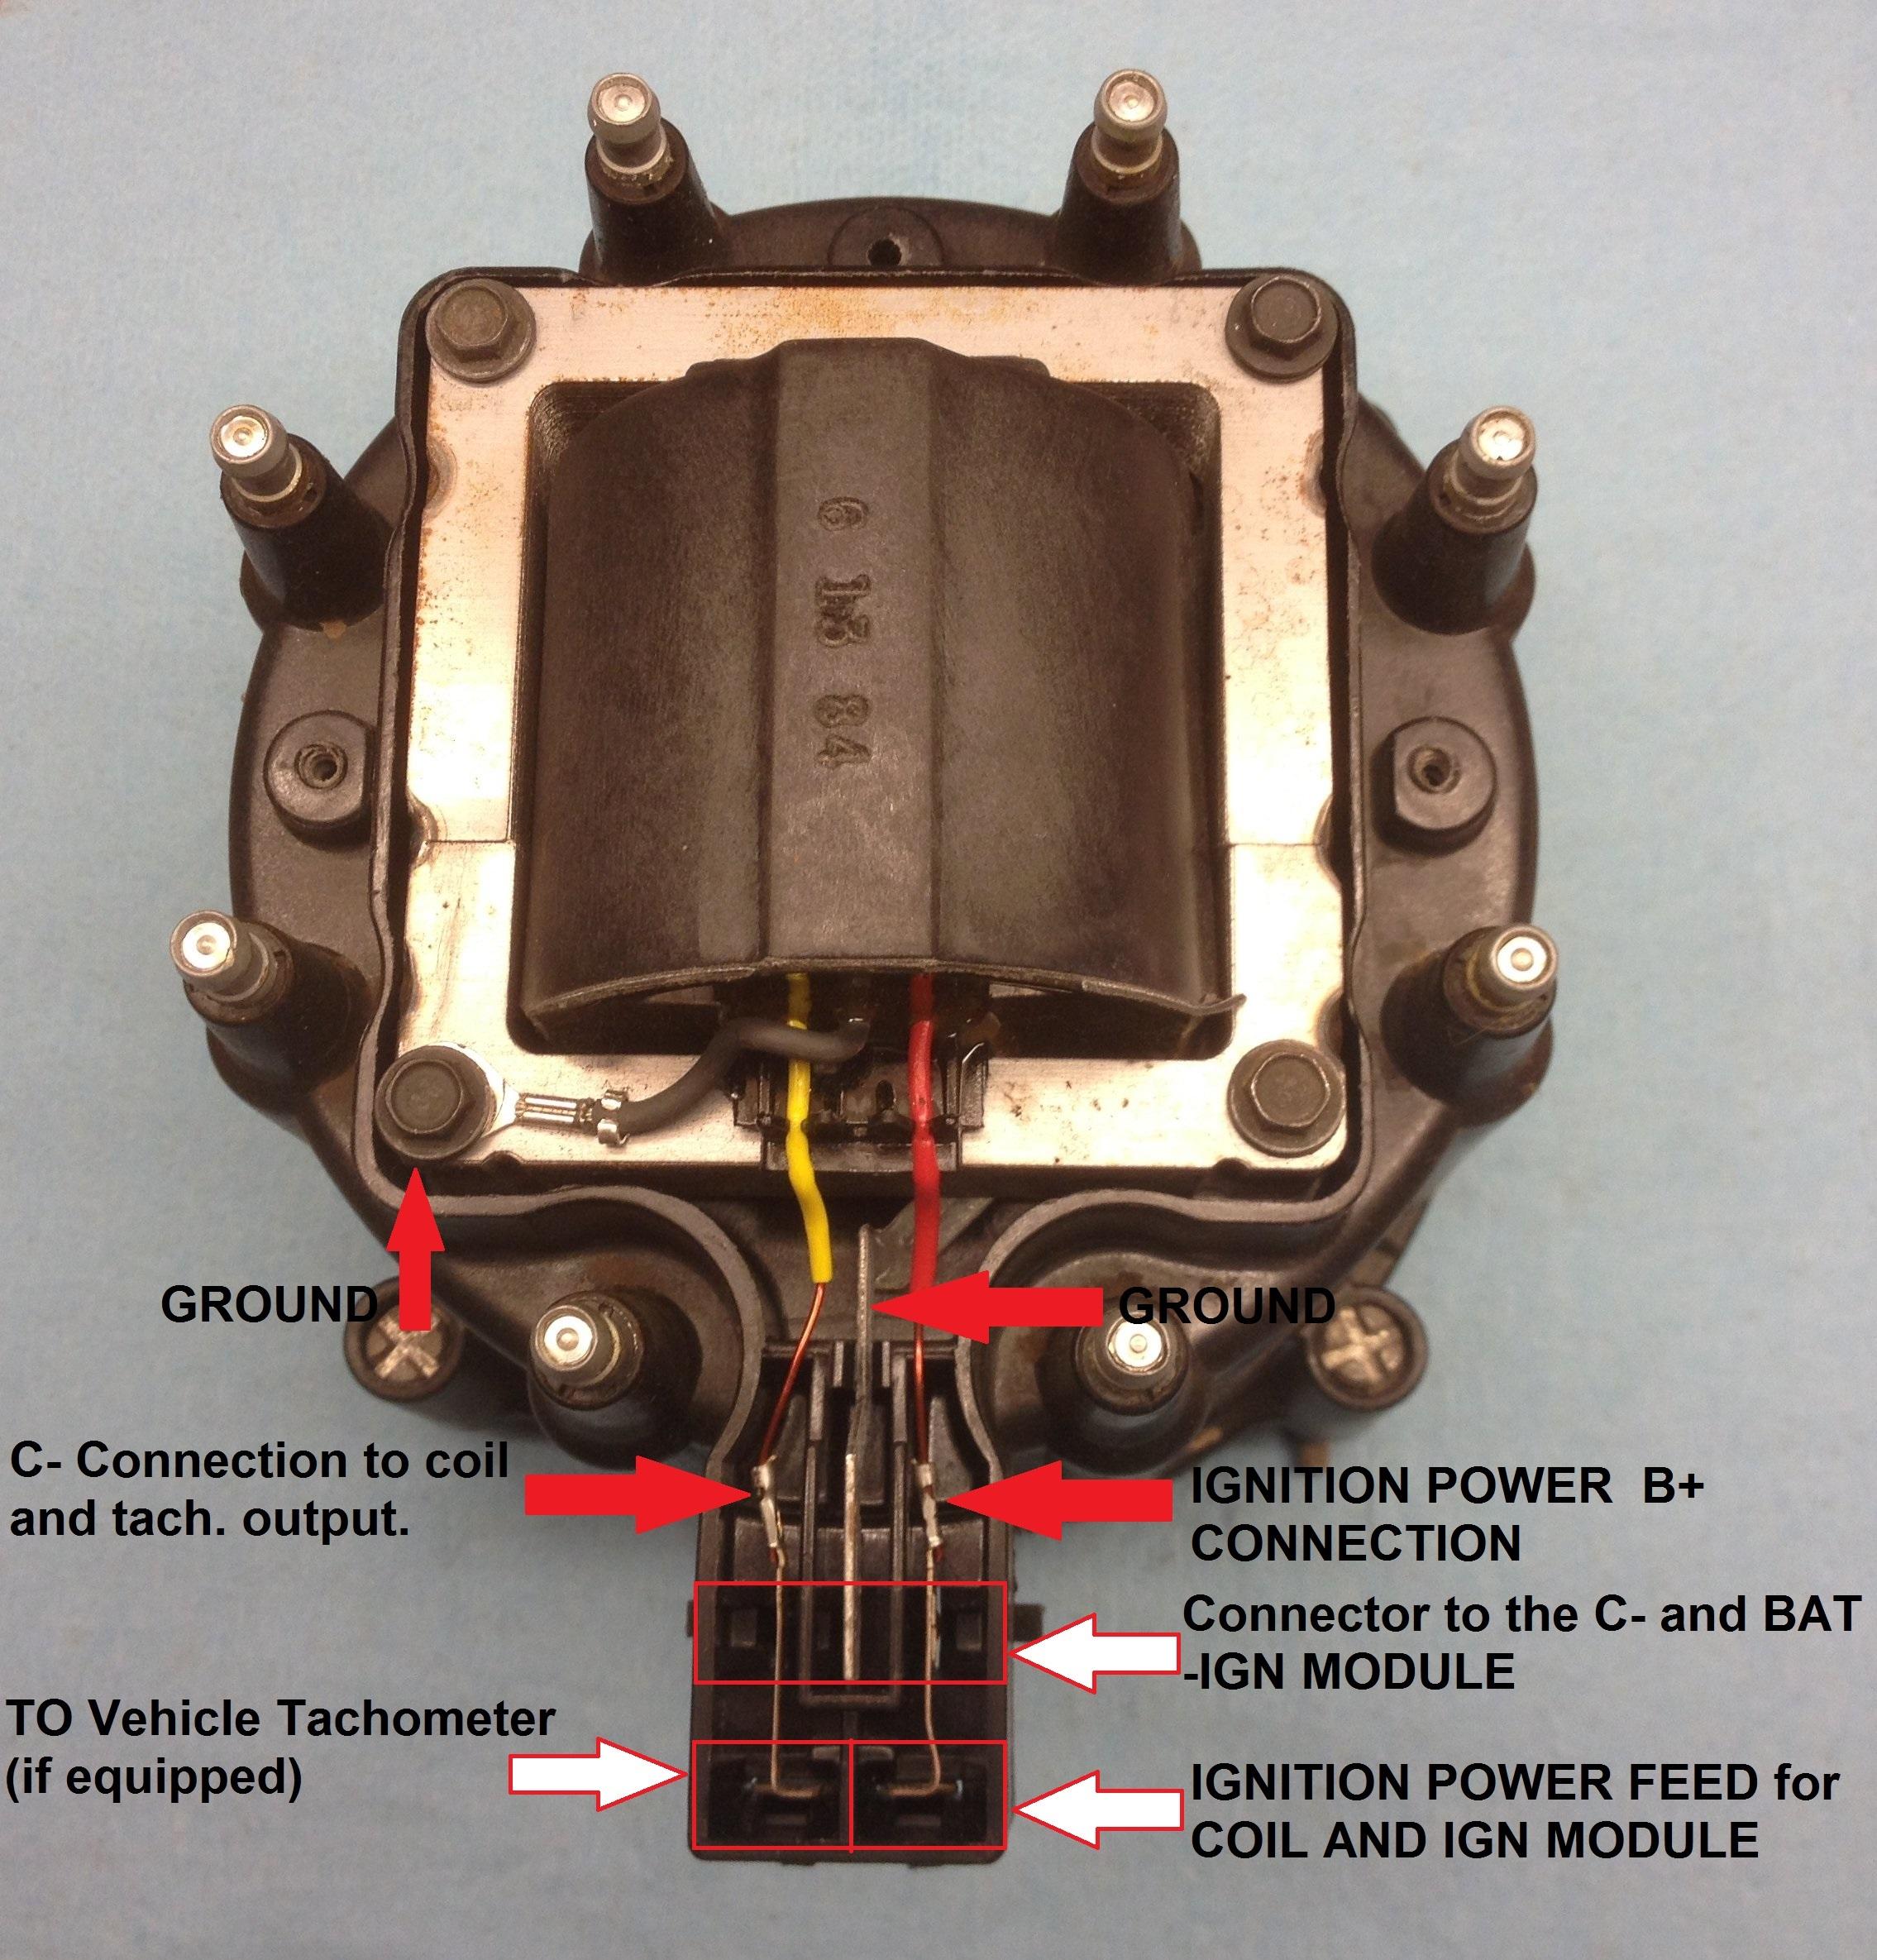 new jeep amc gm hei distributor & plug wires cj5 cj7 yj 258 wire hookup 1  car & truck ignition systems crpsecurity car & truck distributors & parts  crp security systems